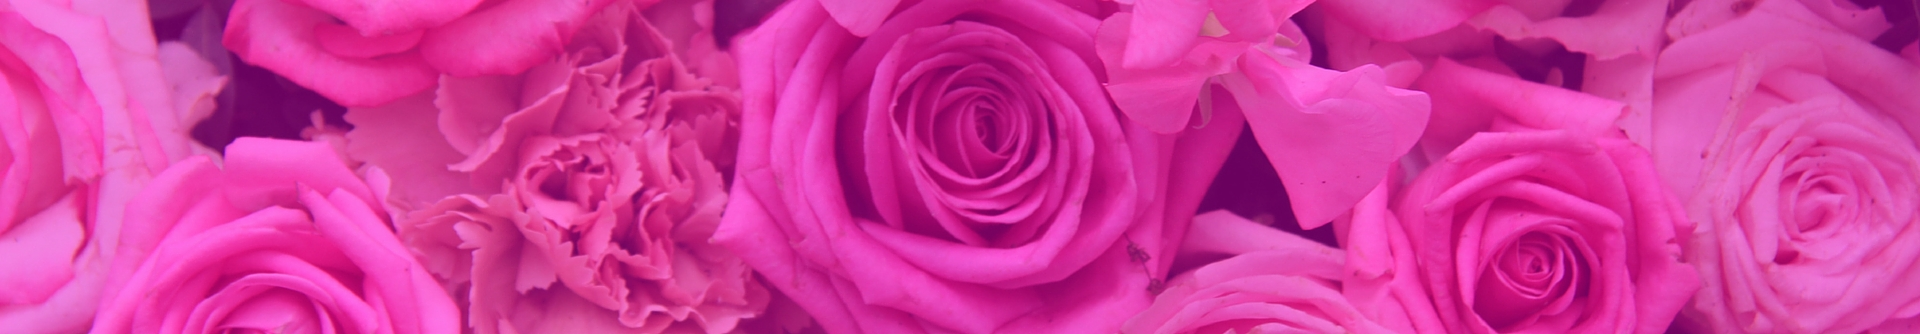 roberts centre wedding flowers header